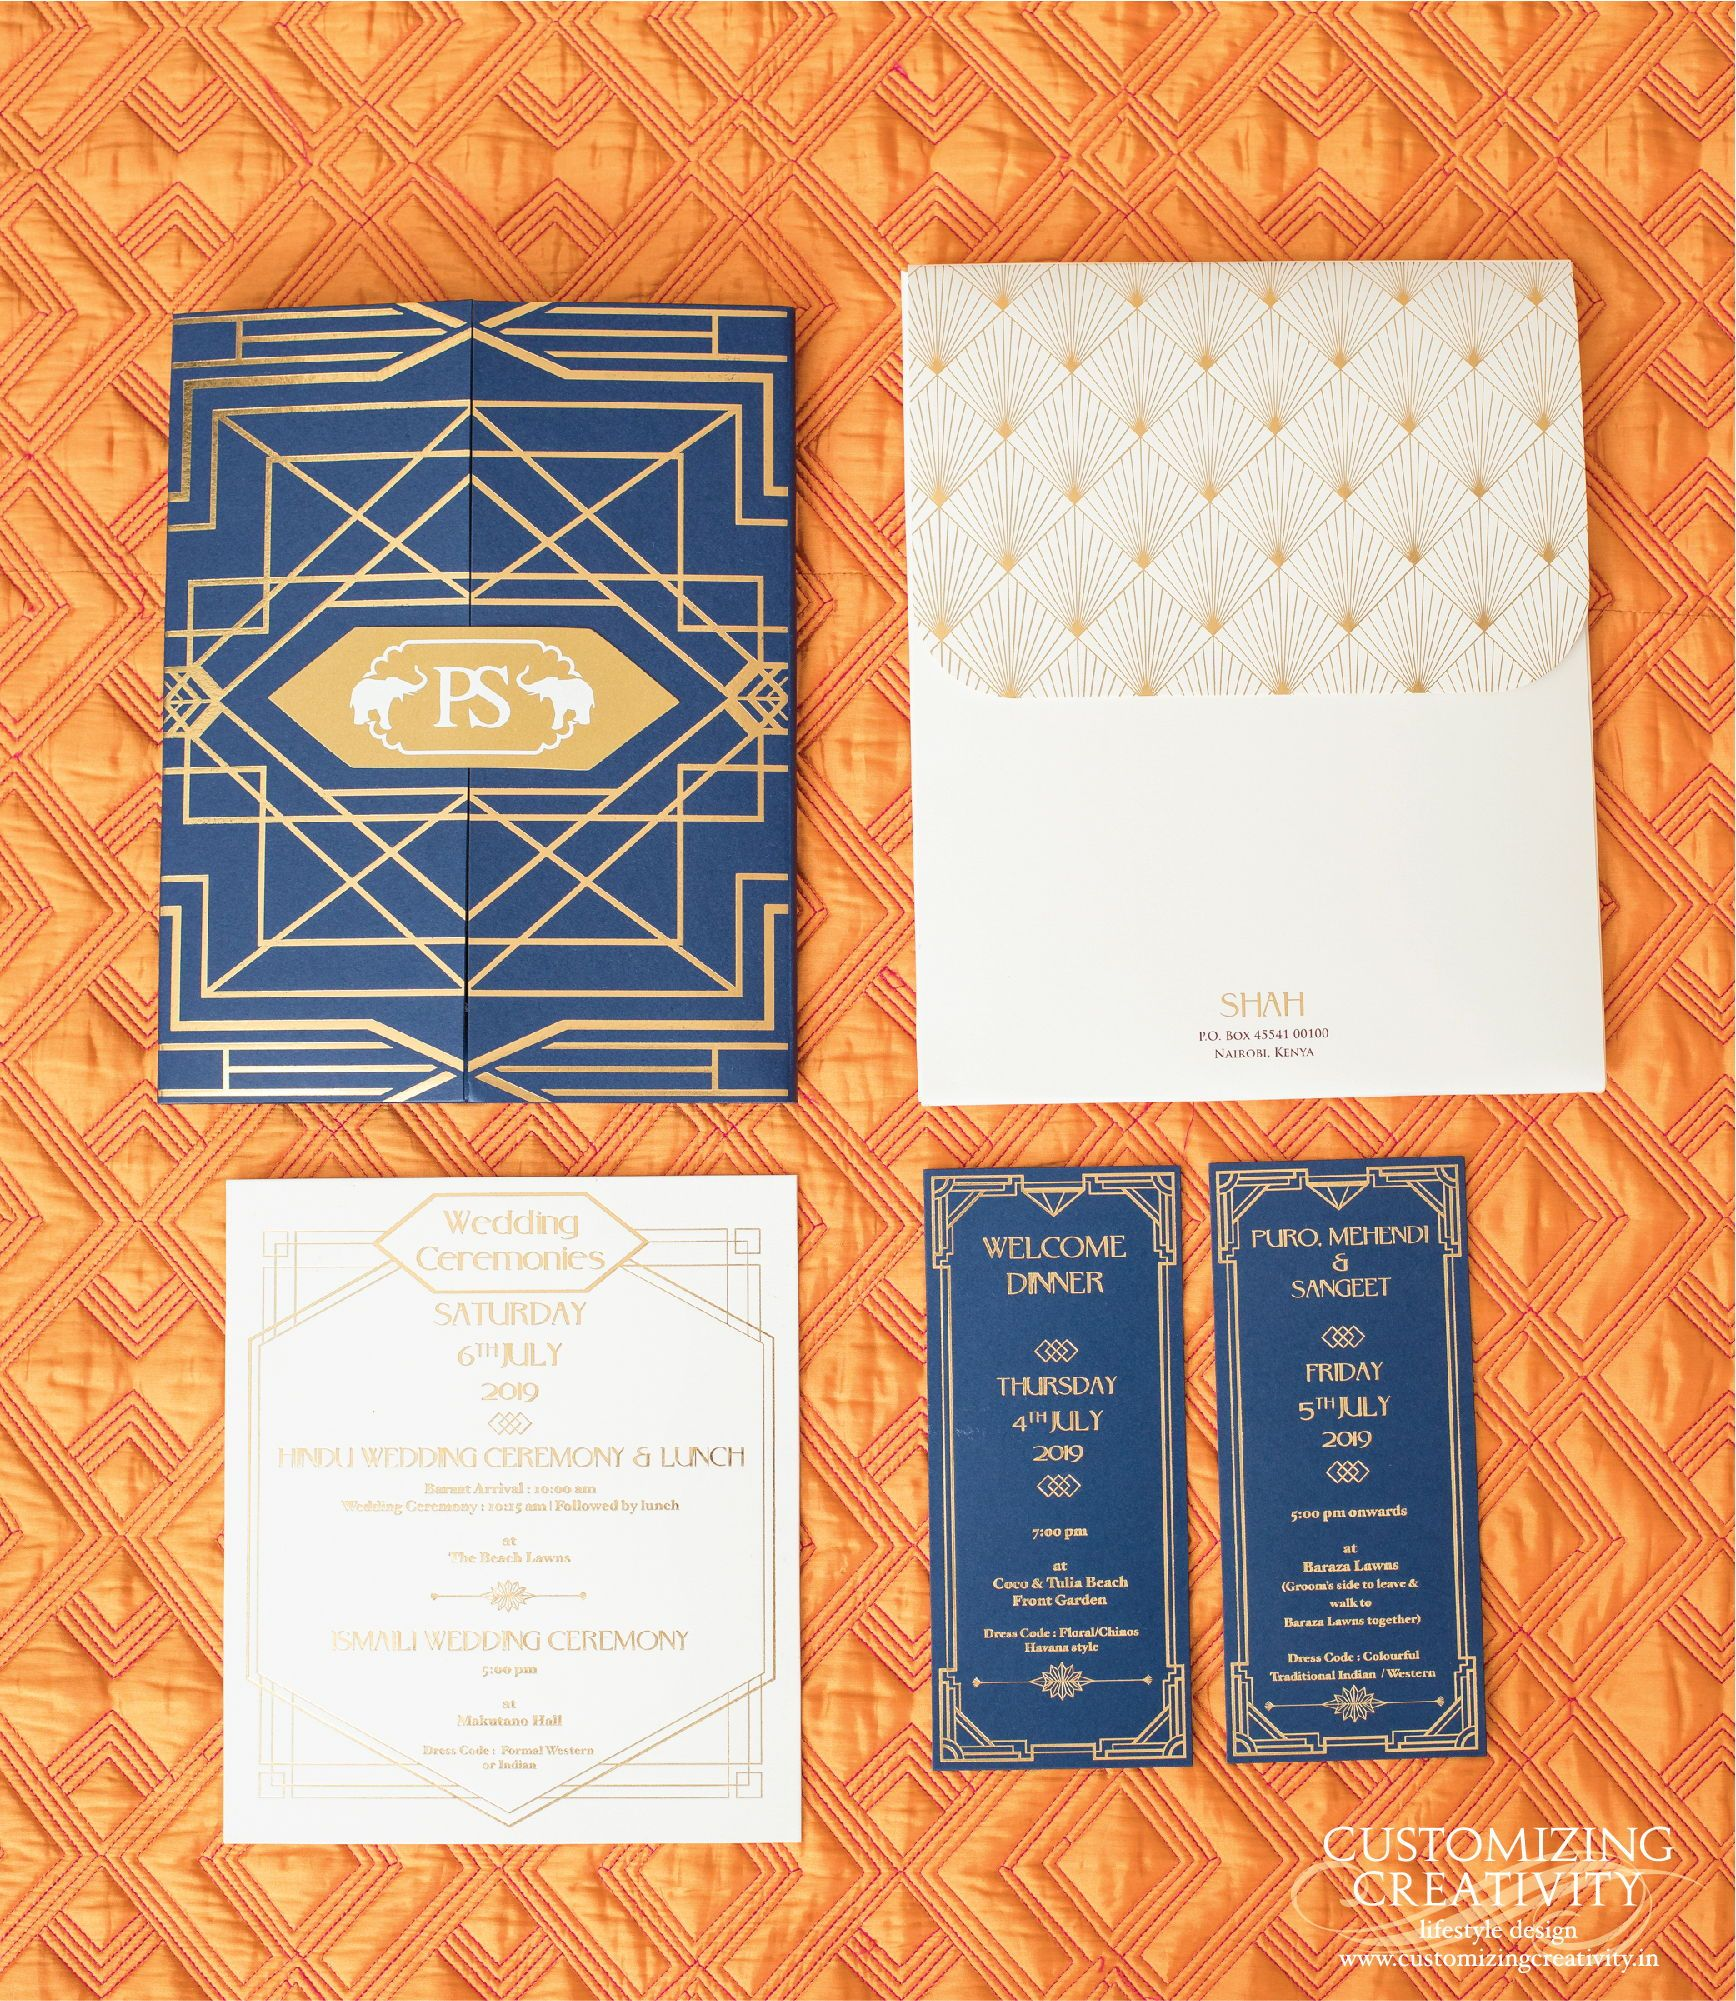 Wedding Invitation Cards Indian Wedding Cards Invites Wedding Stationery E Invite E Invitation Indian Wedding Cards Wedding Cards Wedding Invitation Cards